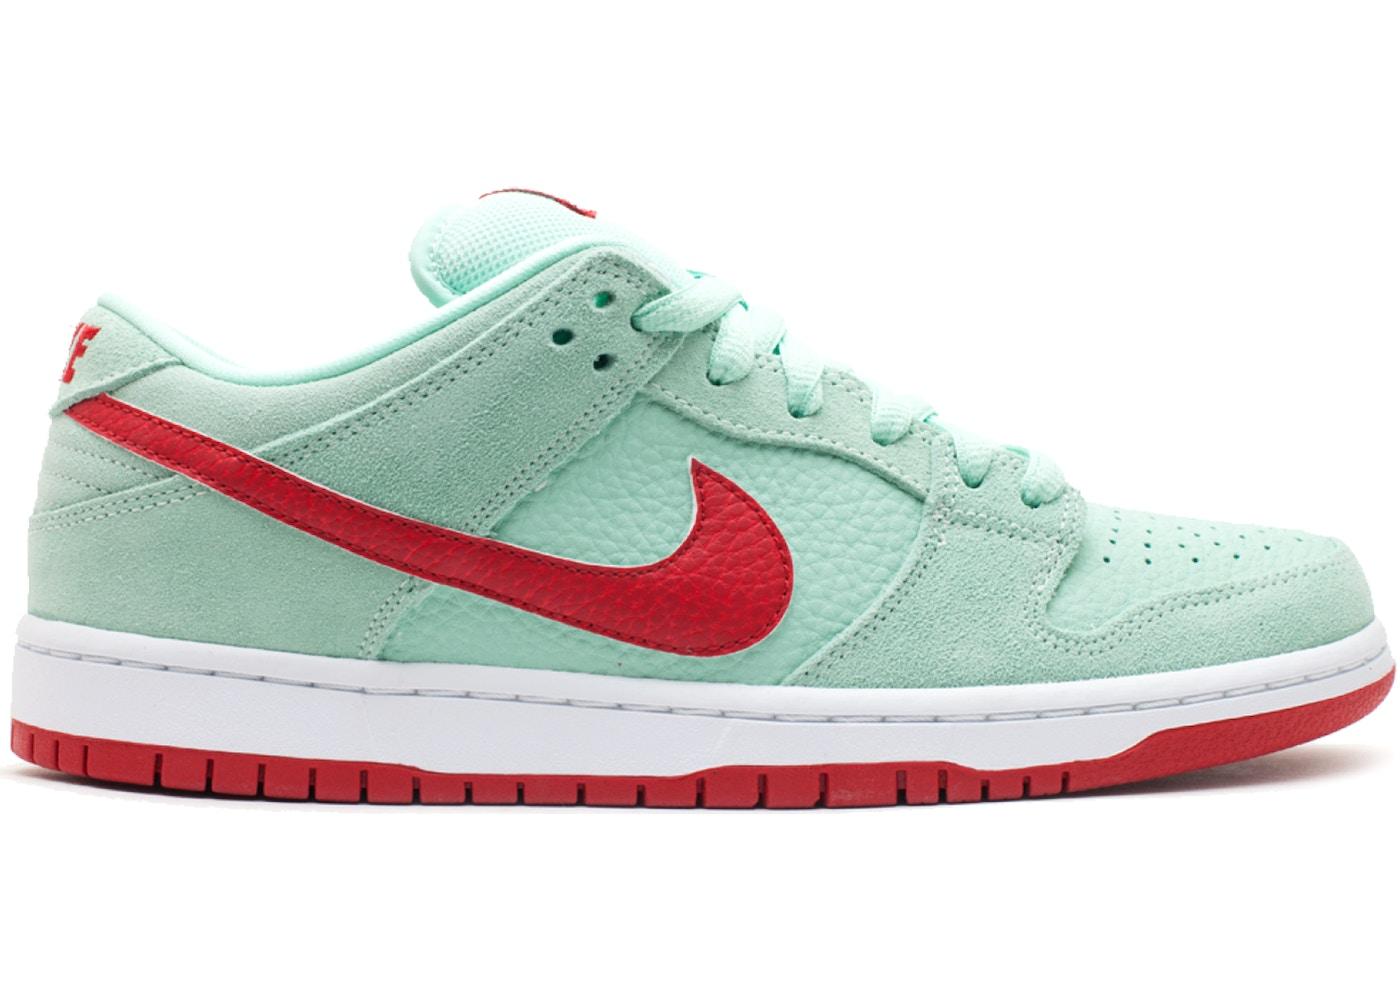 Nike SB Dunk Low Medium Mint Gym Red - 304292-360